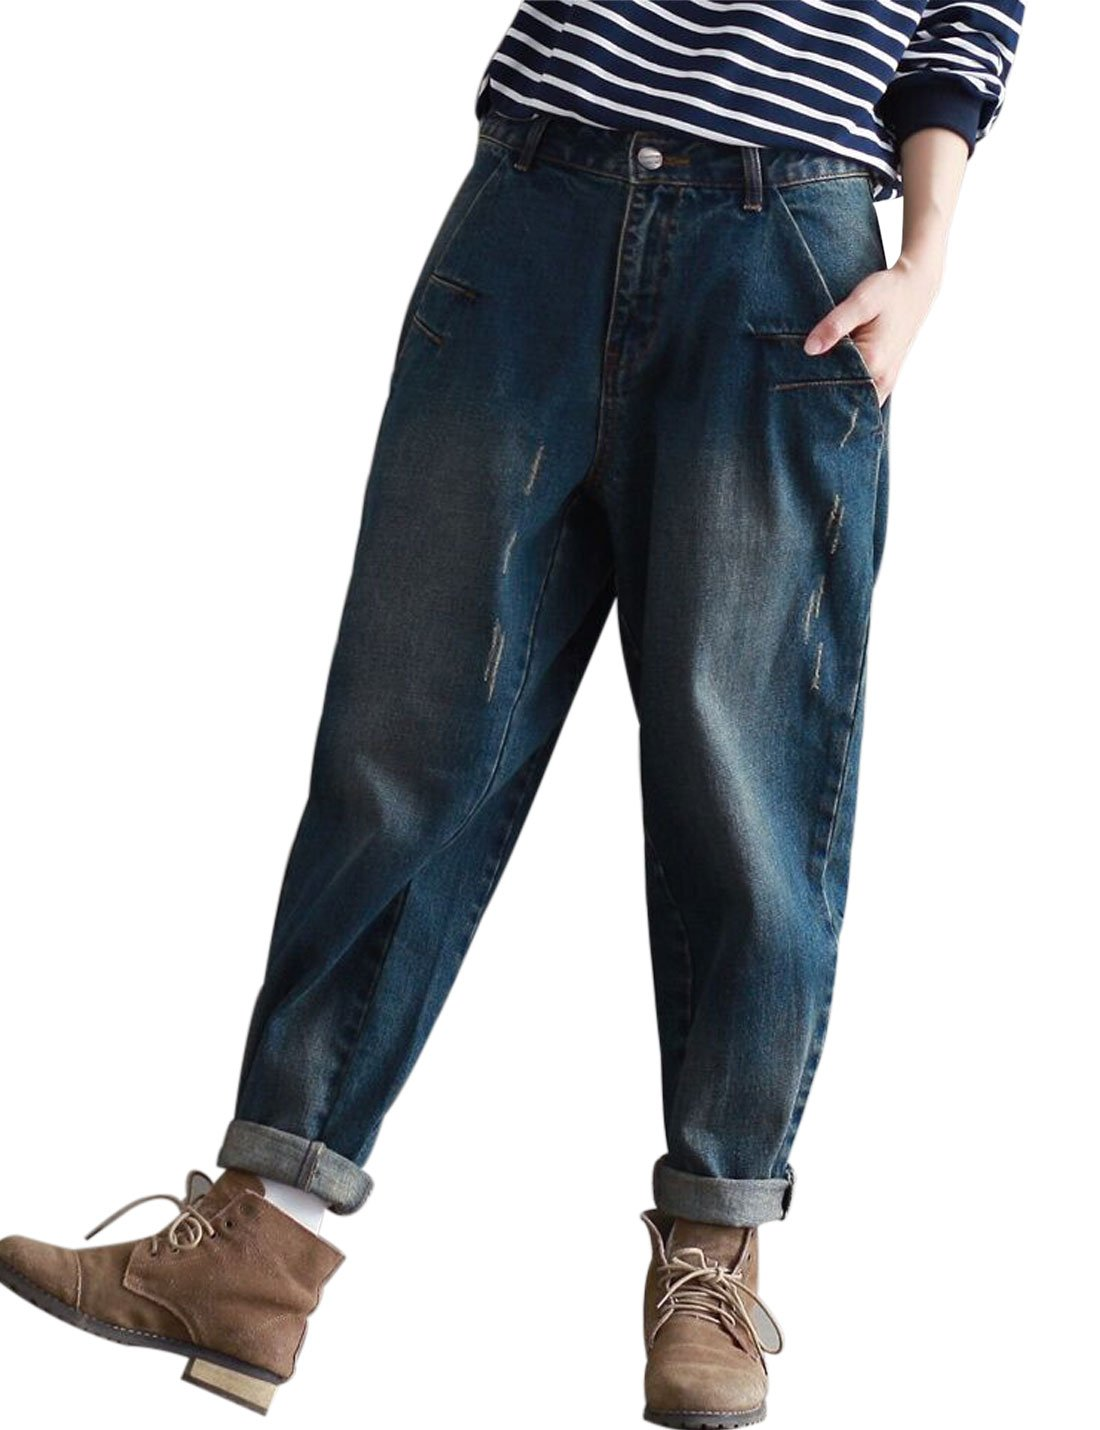 Yeokou Women's Casual Loose Distressed Baggy Harem Denim Jeans Cropped Pants (Large, Dark Blue) by Yeokou (Image #2)